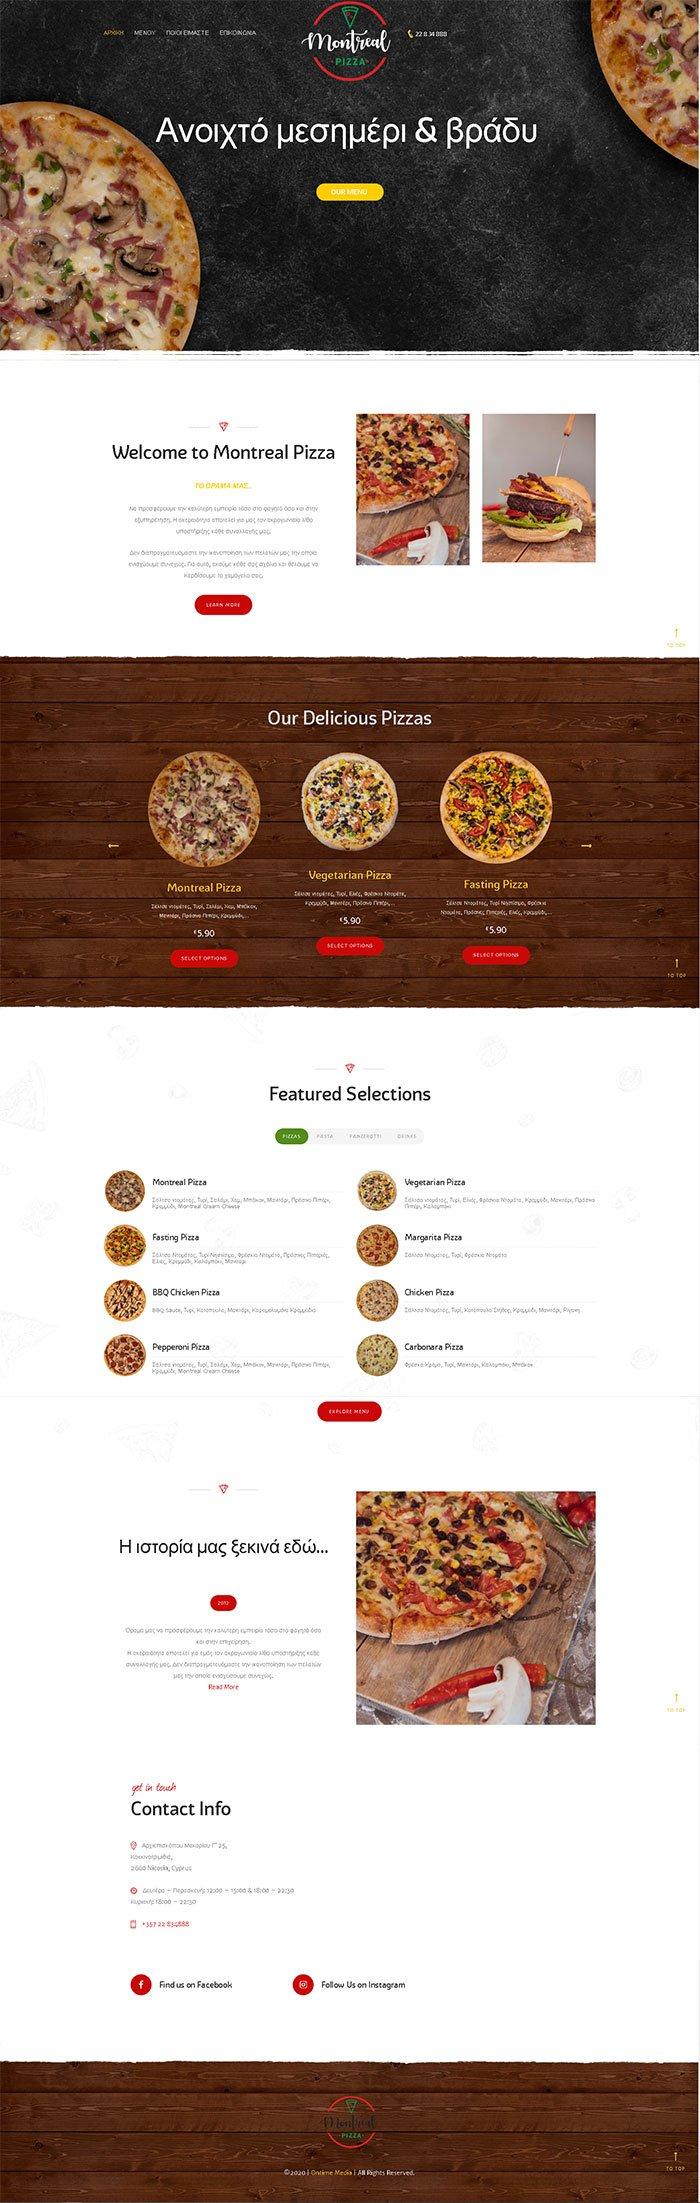 Montreal pizza website mockup